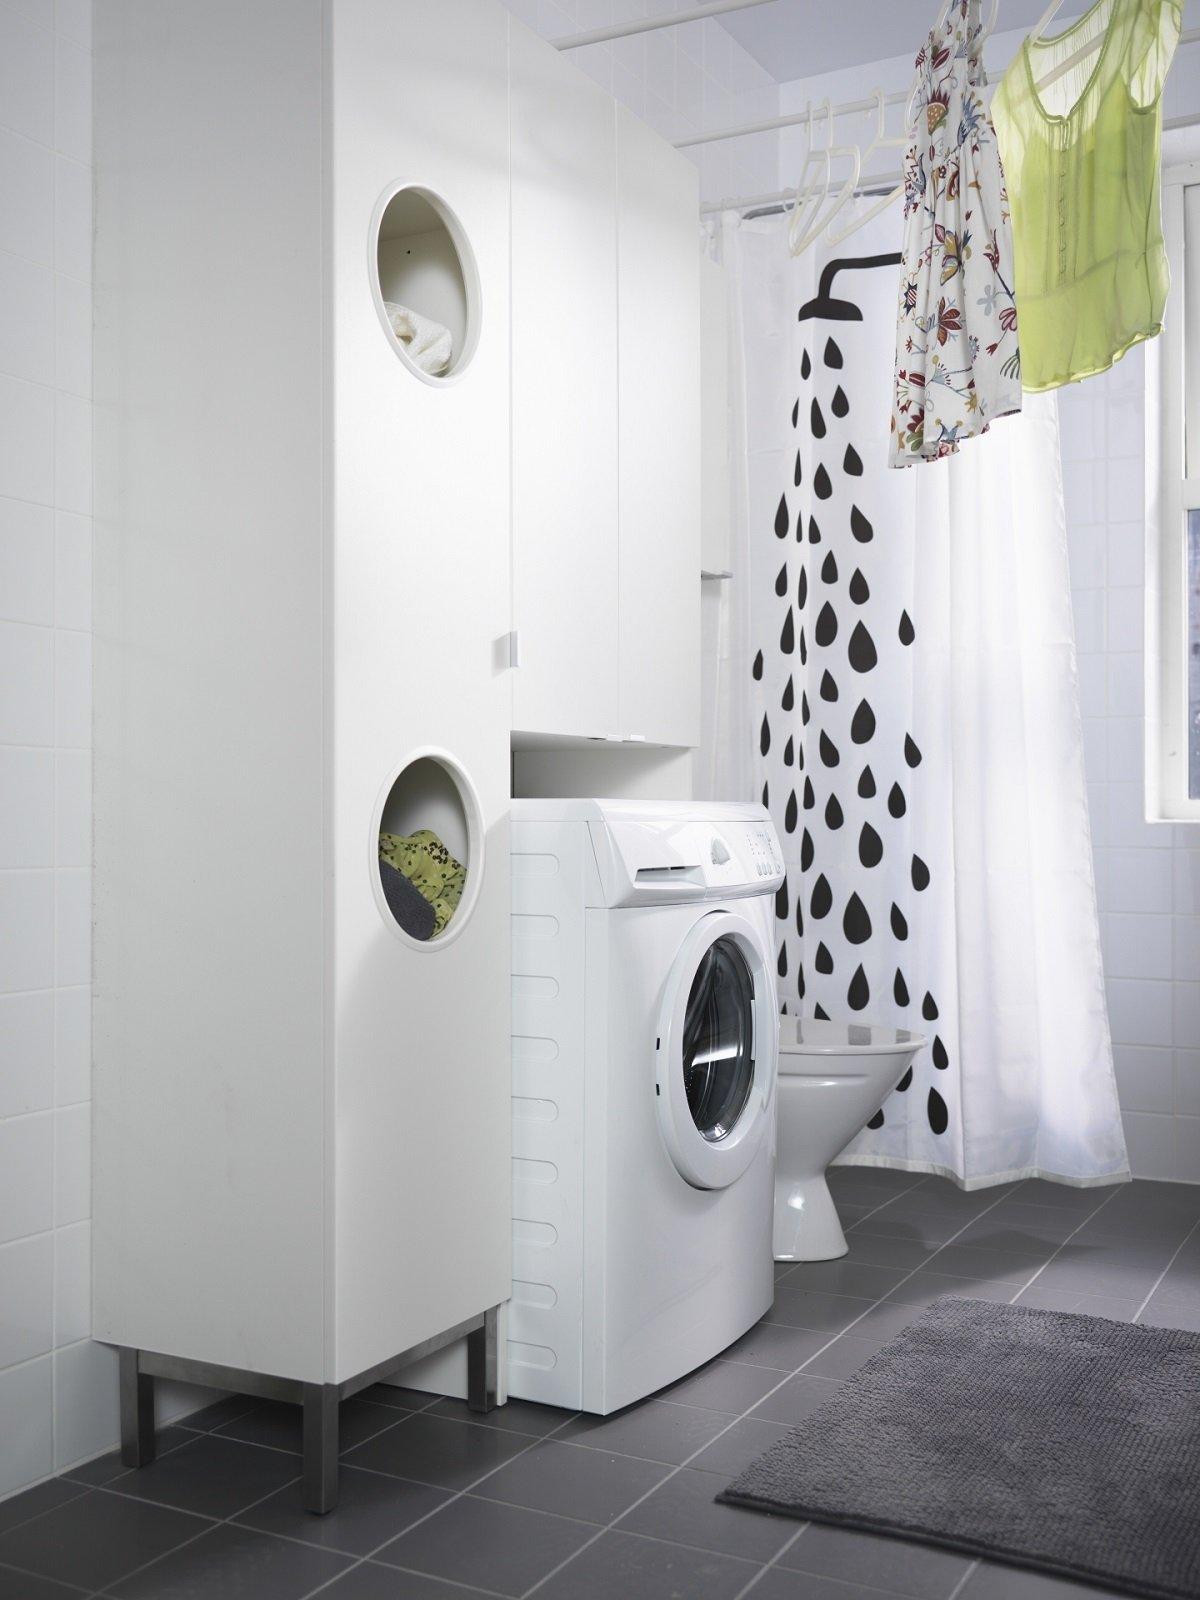 Lavanderia in bagno cose di casa - Ikea lavanderia mobili ...